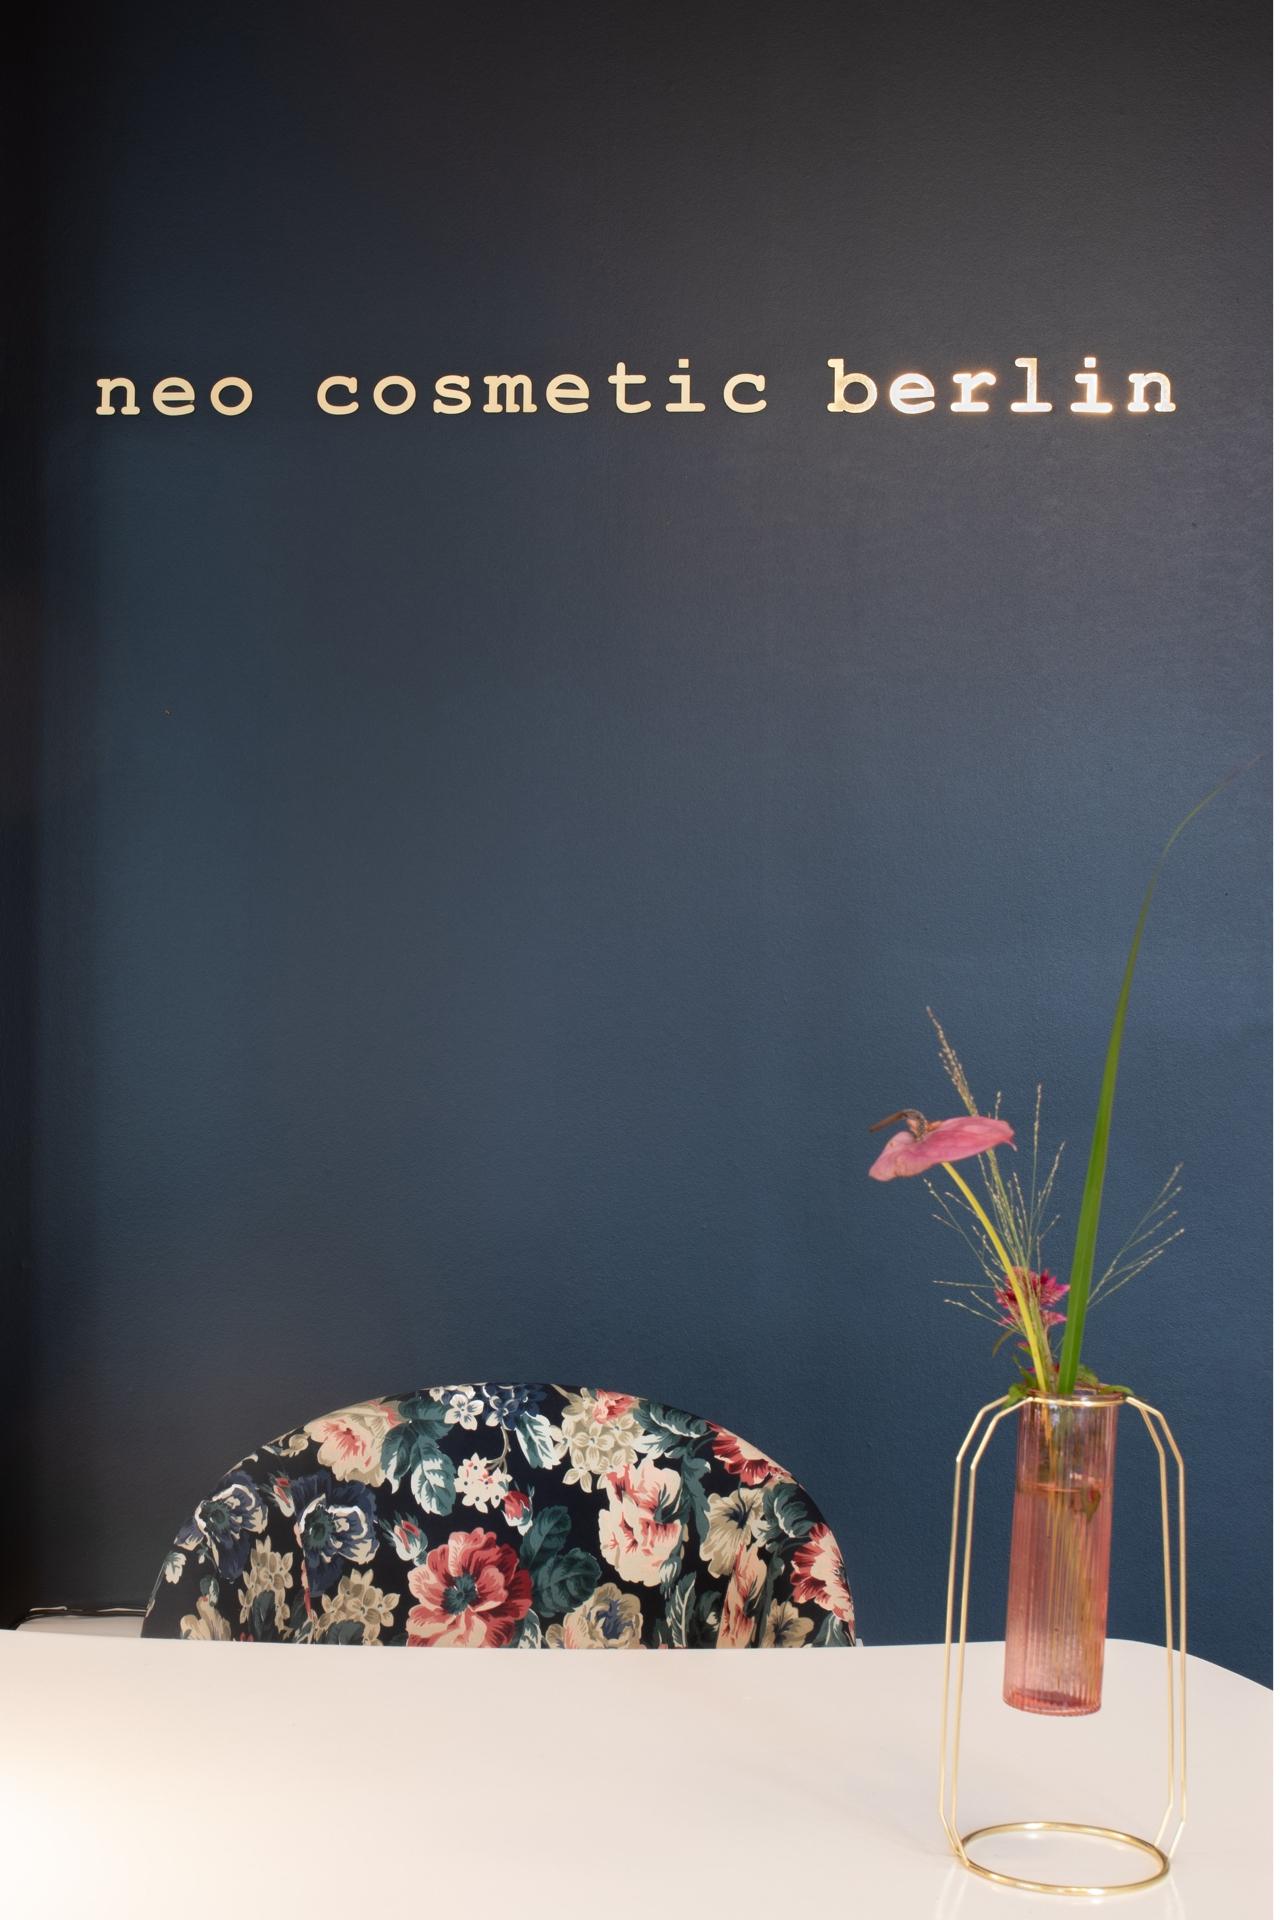 neo cosmetic berlin